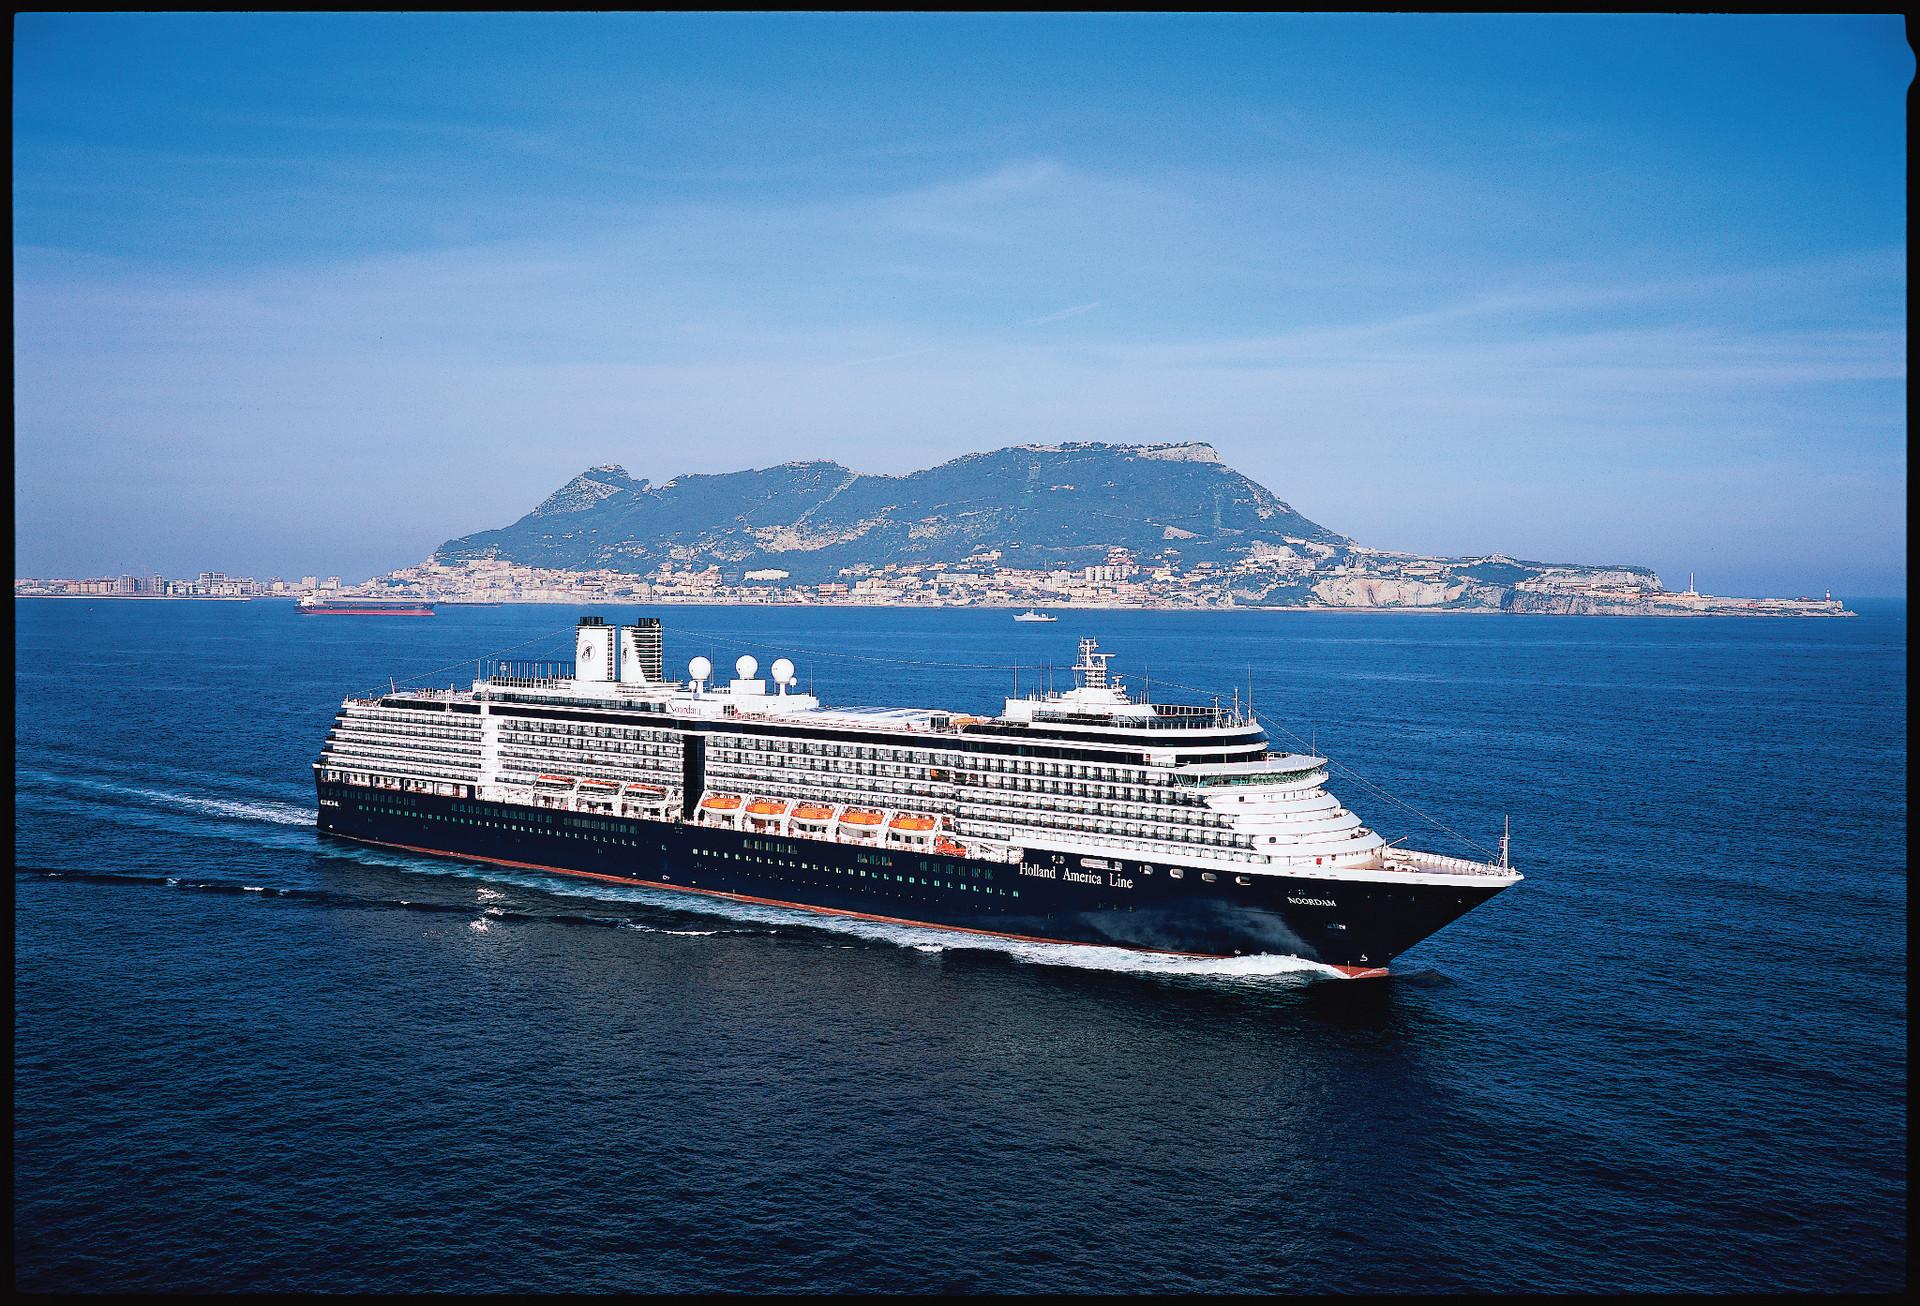 Relax, unwind take a cruise